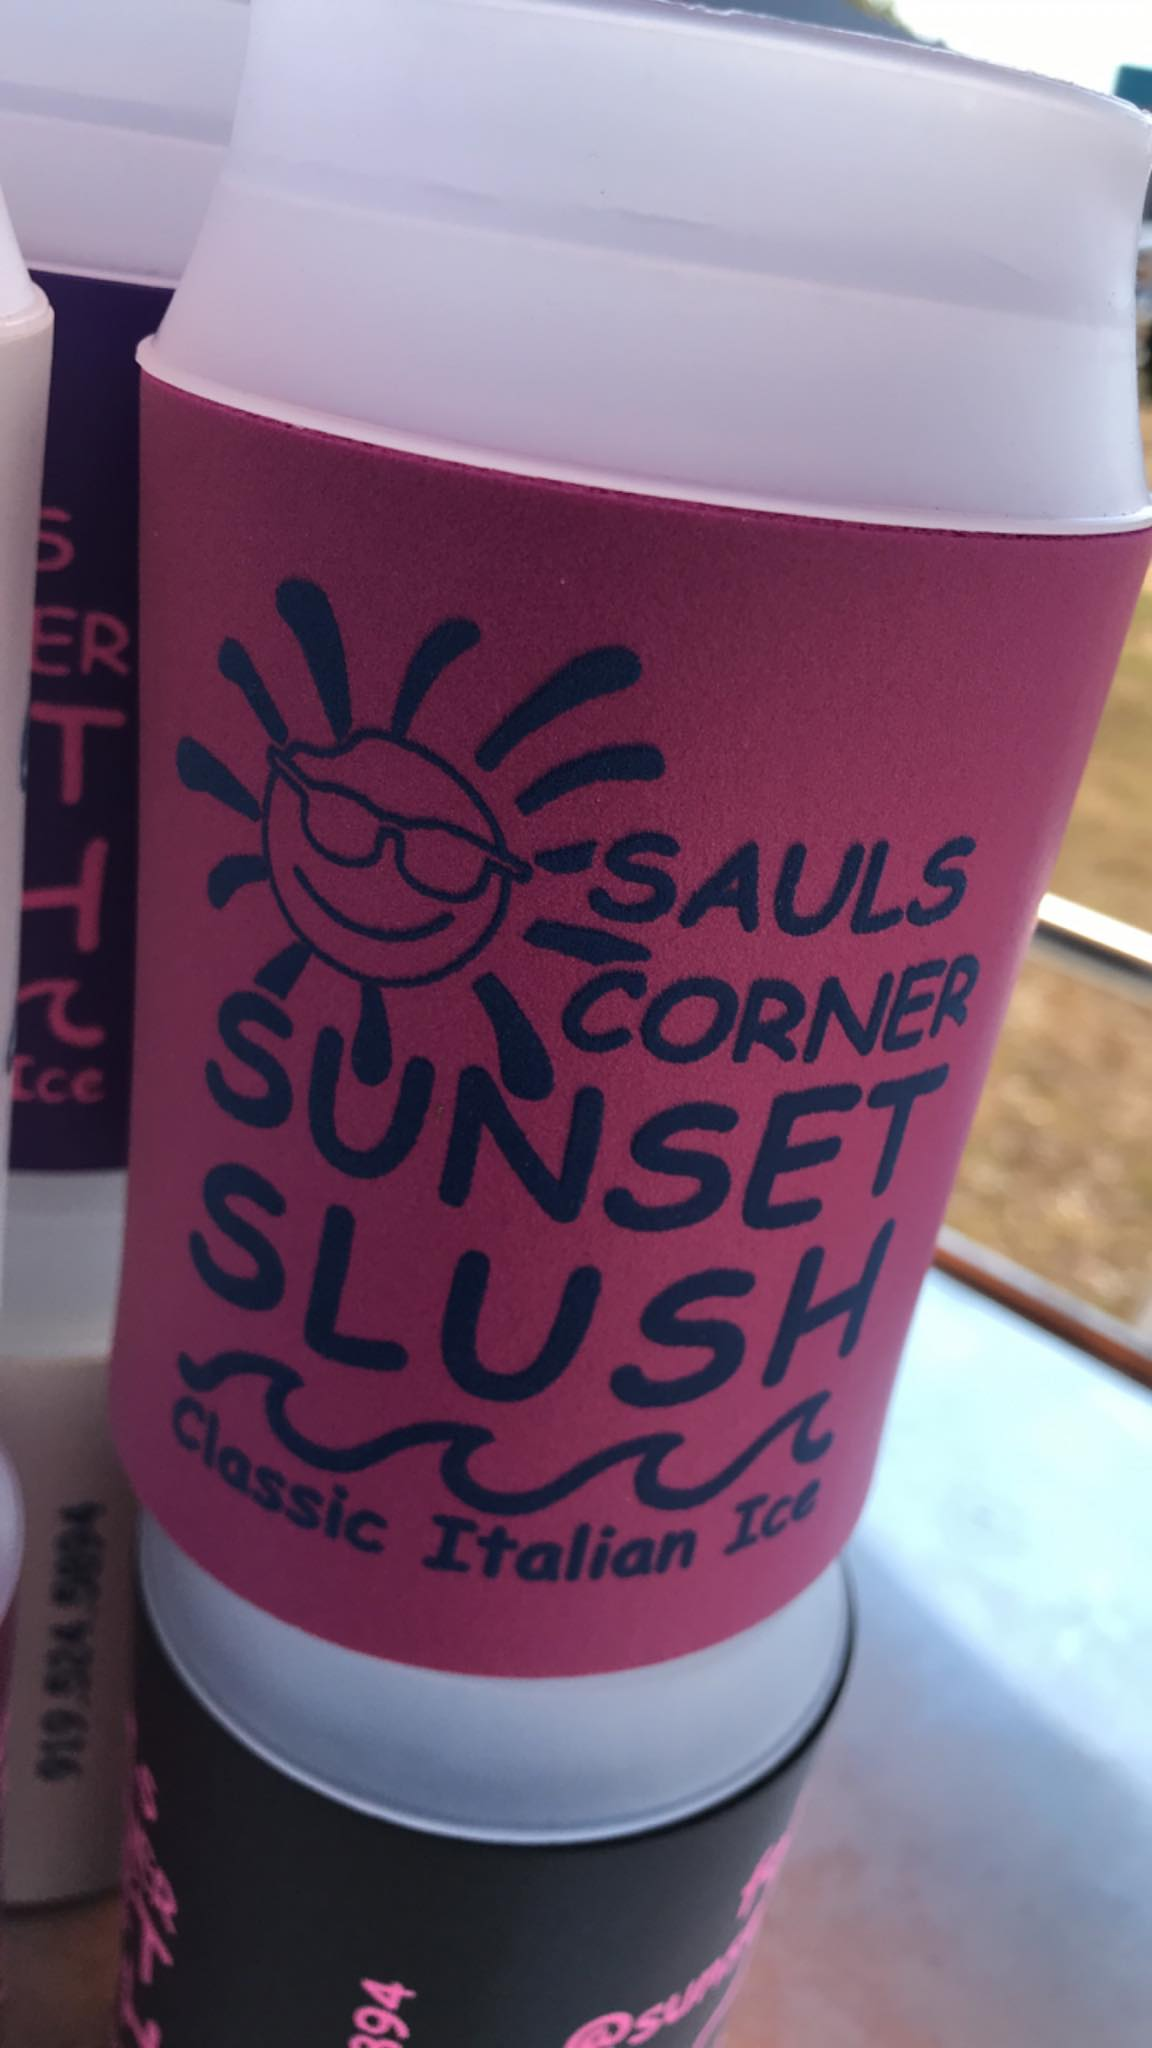 Sunset Slush at Sauls Corner 3340 Benson Rd, Garner